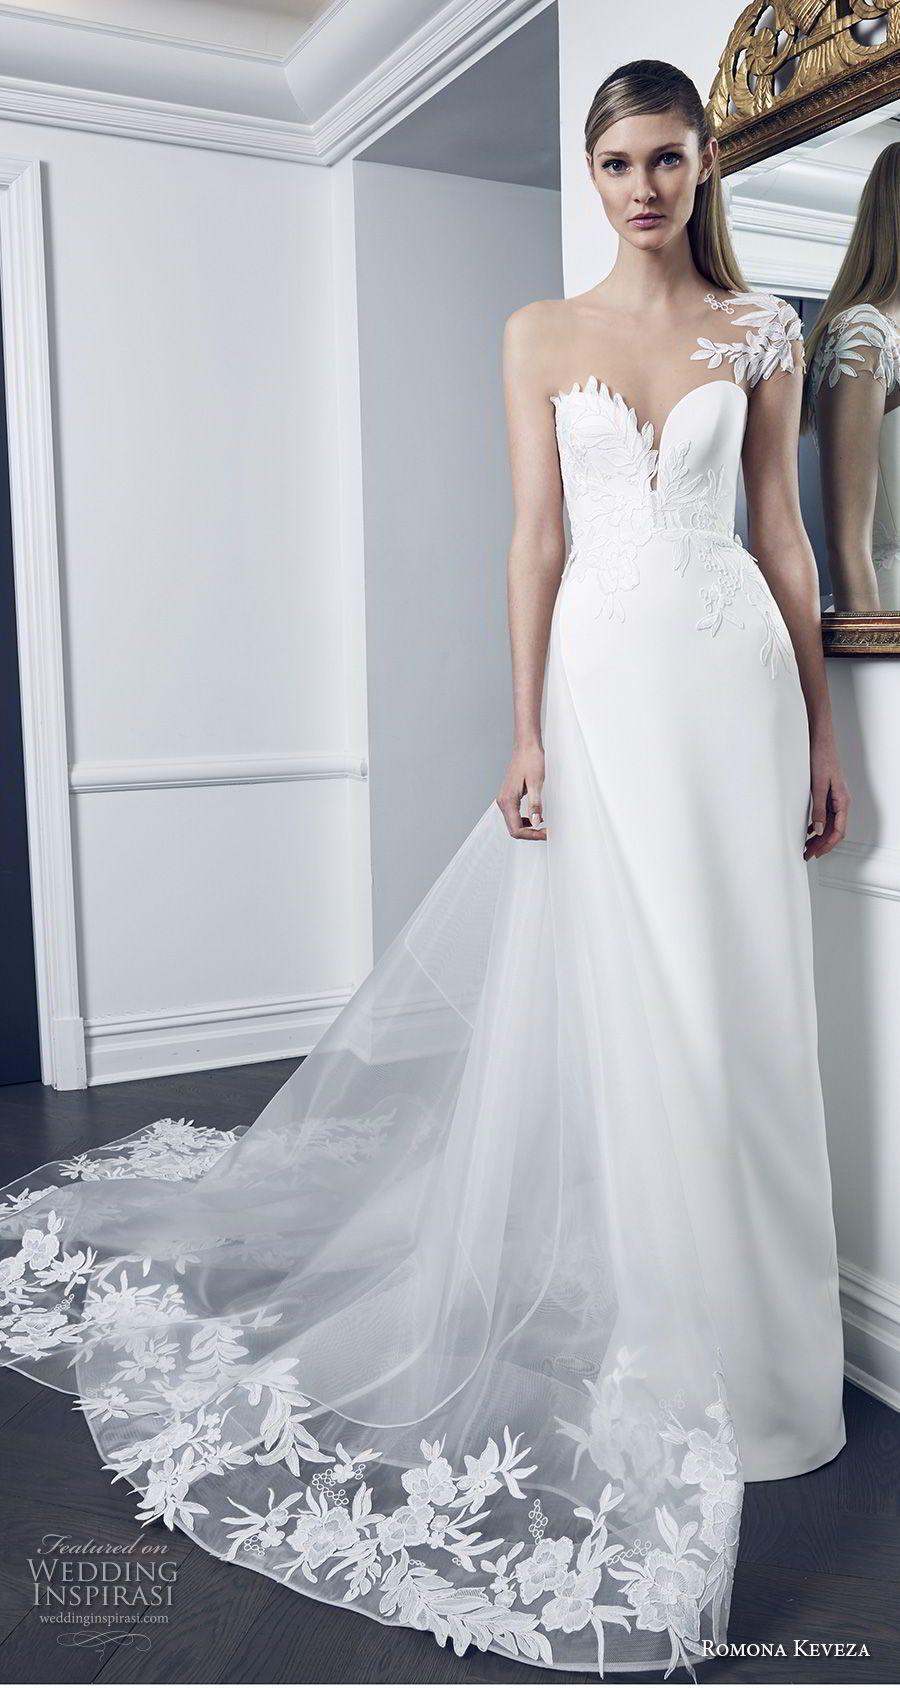 Romona Keveza Collection Bridal Herbst 2018 Brautkleider   Pinterest ...